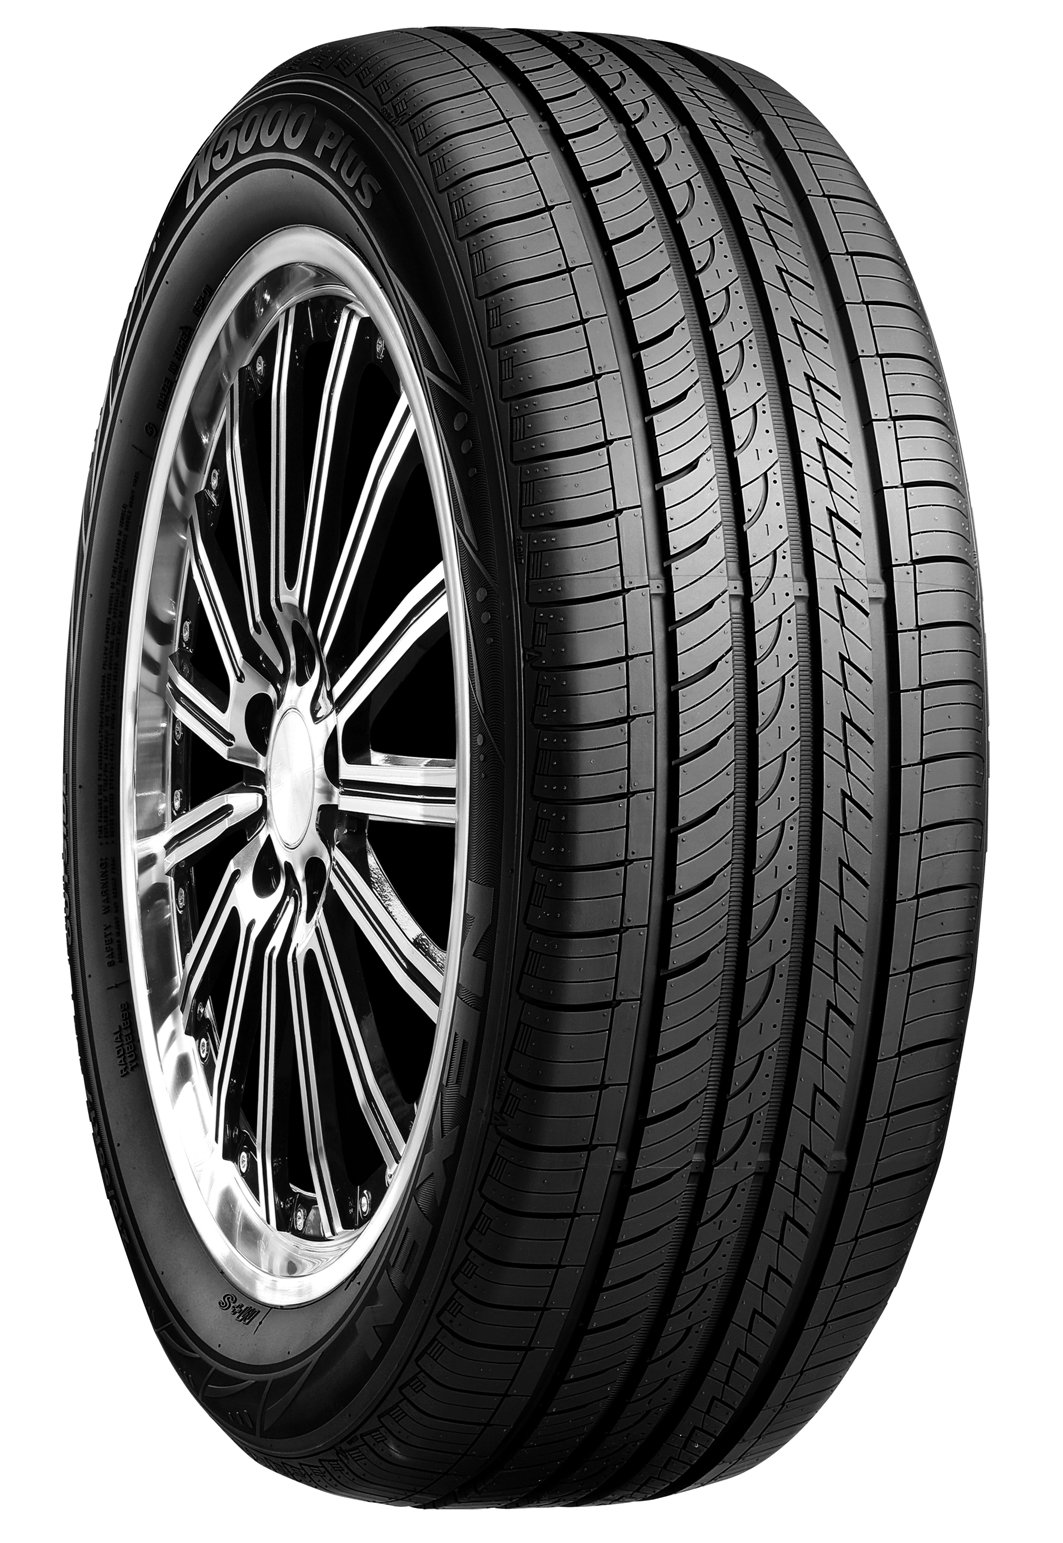 Nexen N5000 Plus All-Season Radial Tire - 235/55R19 101H by Nexen (Image #1)